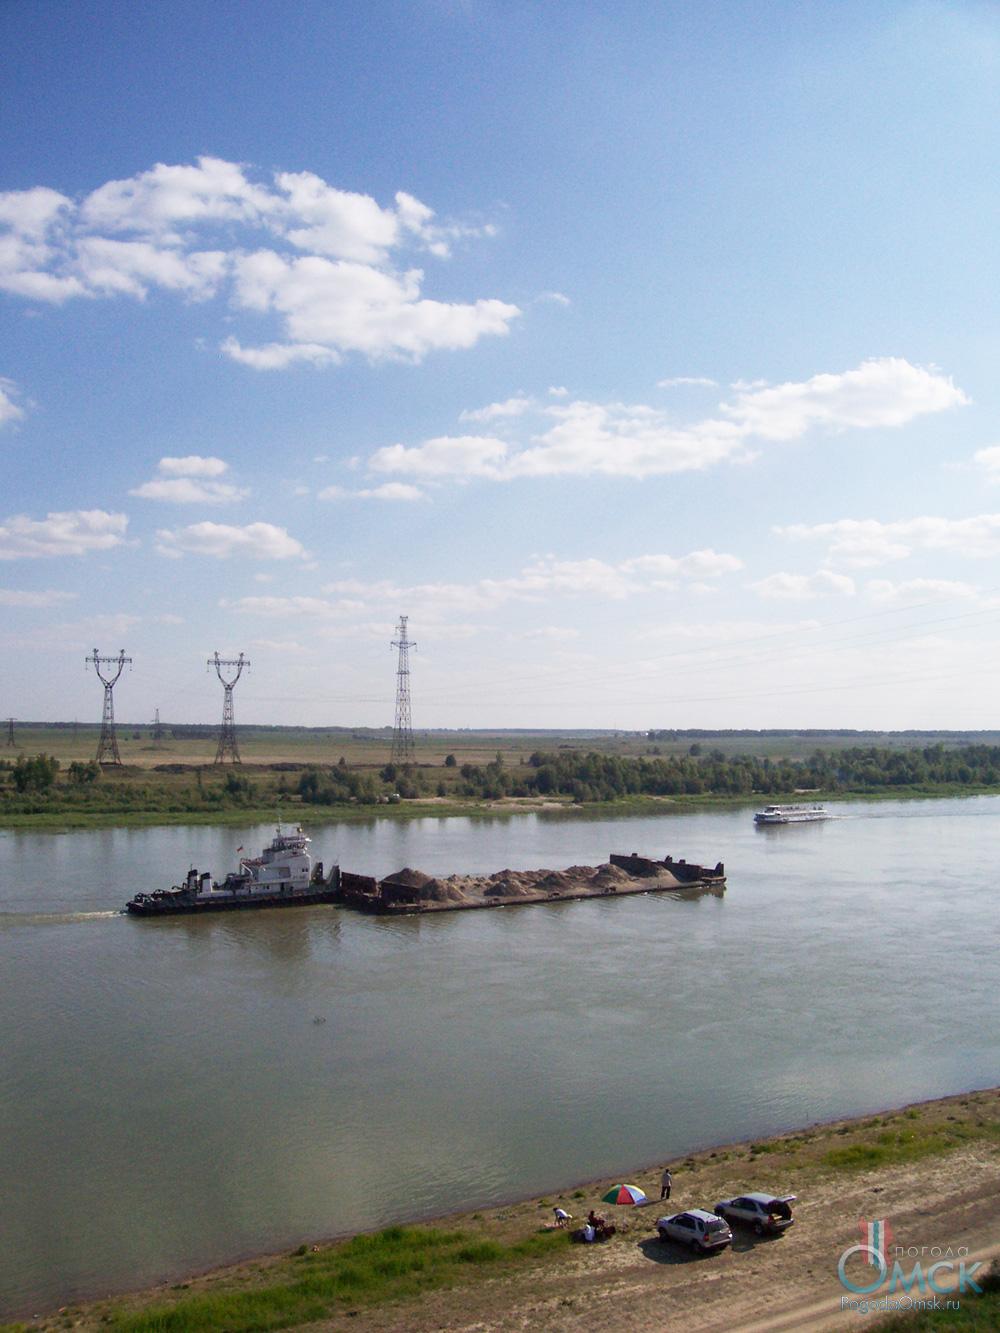 Навигация на Иртыше